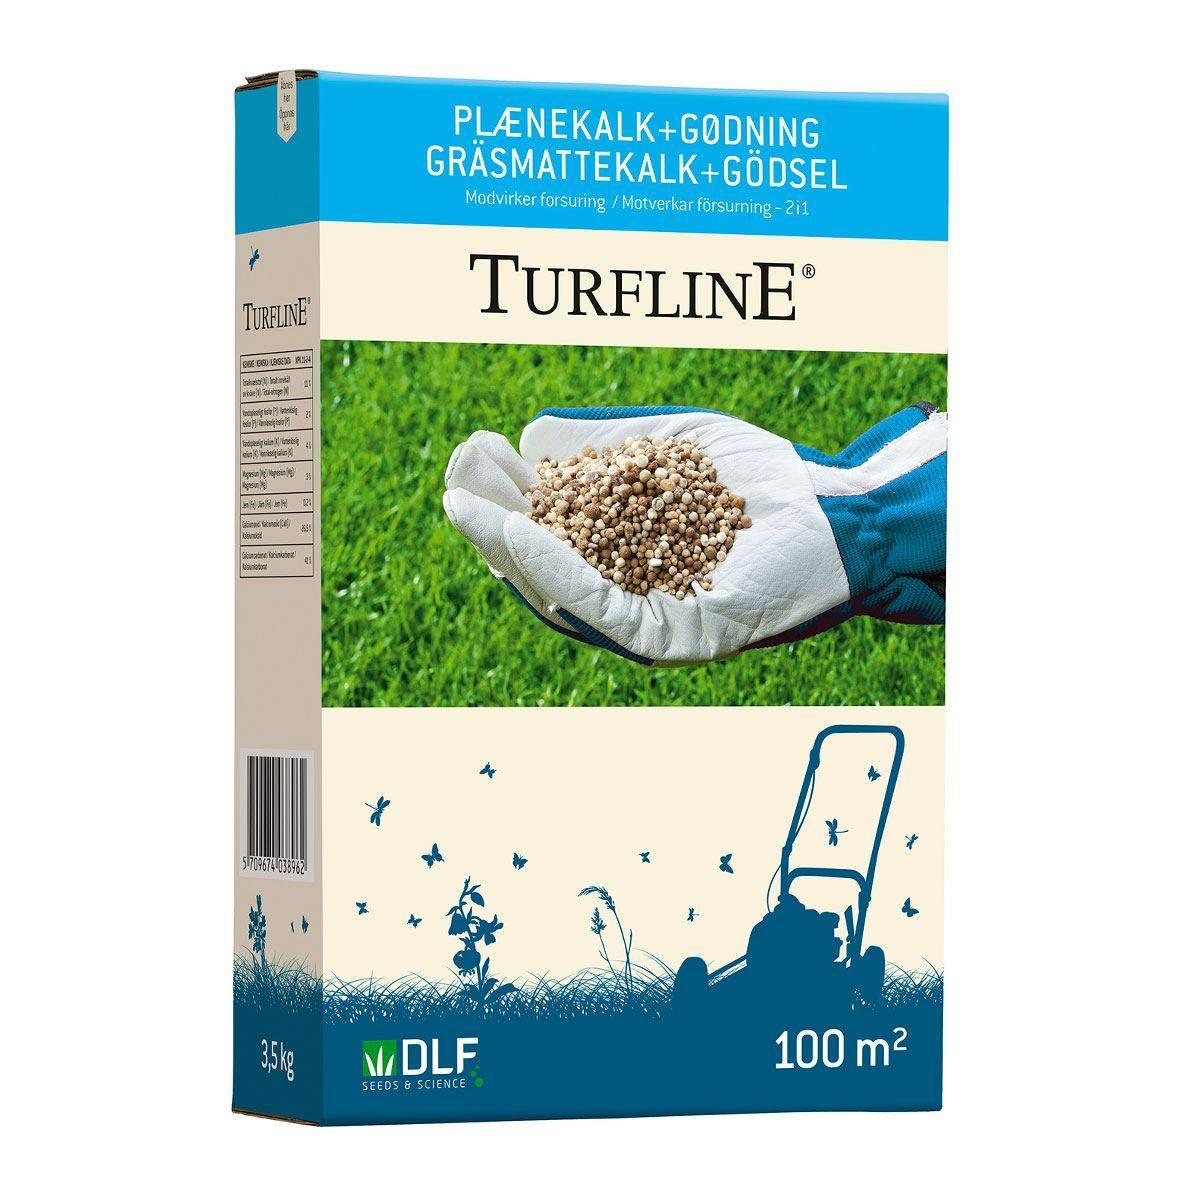 Turfline Plænekalk + Gødning 2-i-én - 3,5 kg / 100 m2